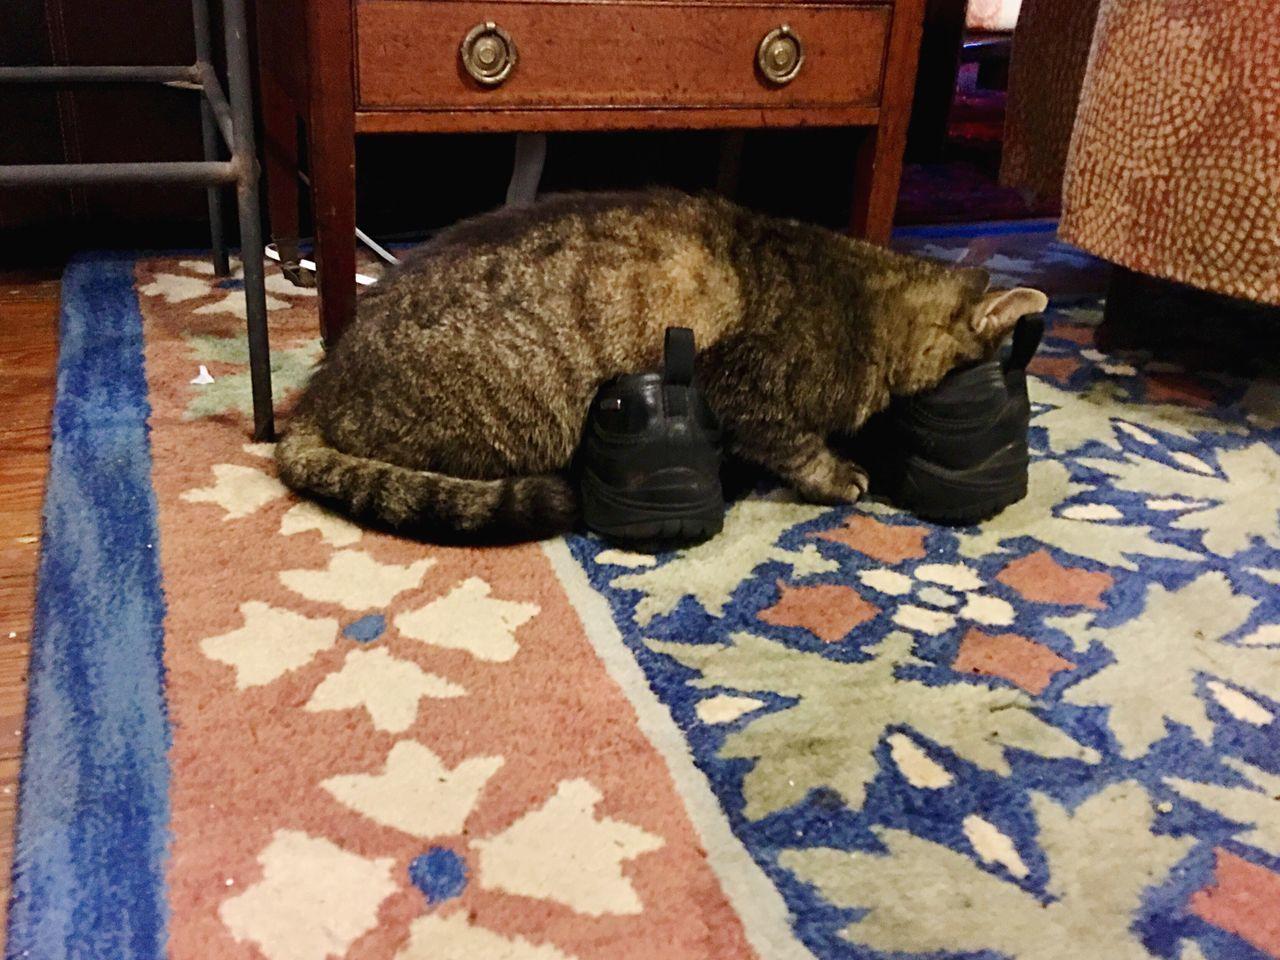 Cat face in shoe